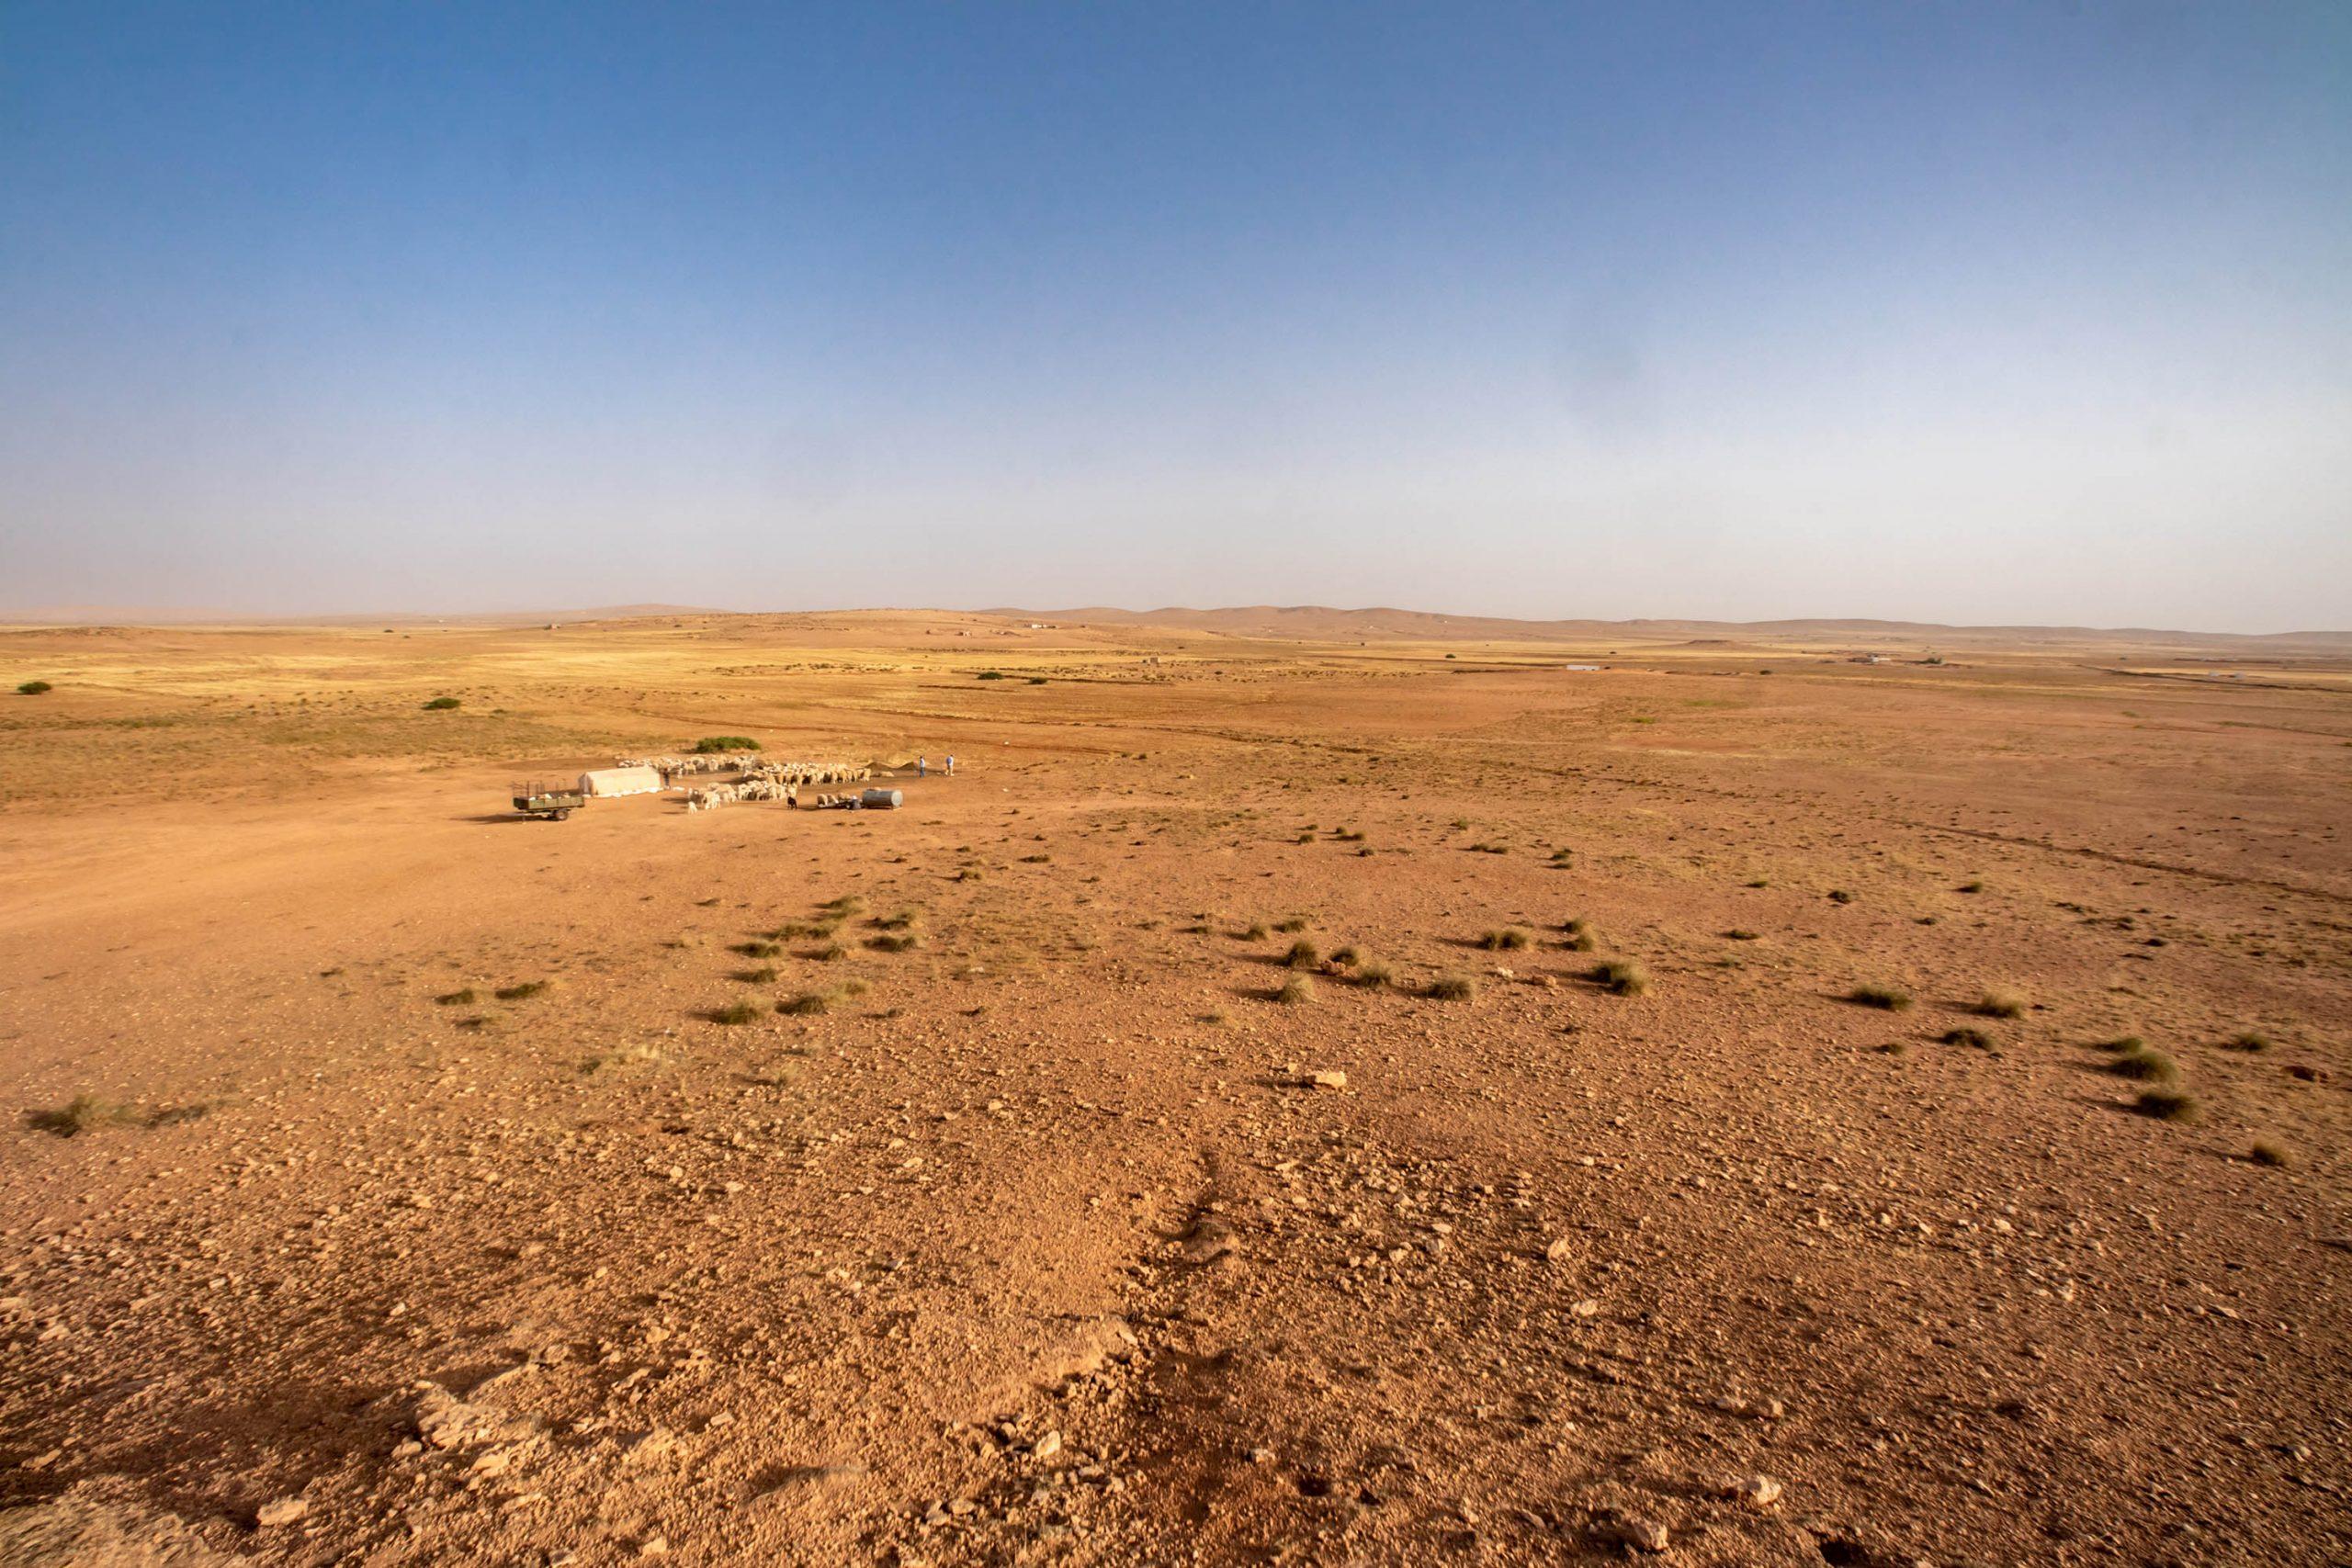 28 June 2020: The Algerian steppe between the verdant Mediterranean coast to the north and the unforgiving Sahara Desert to the south. (Photograph by Abderazak HadjTahar)